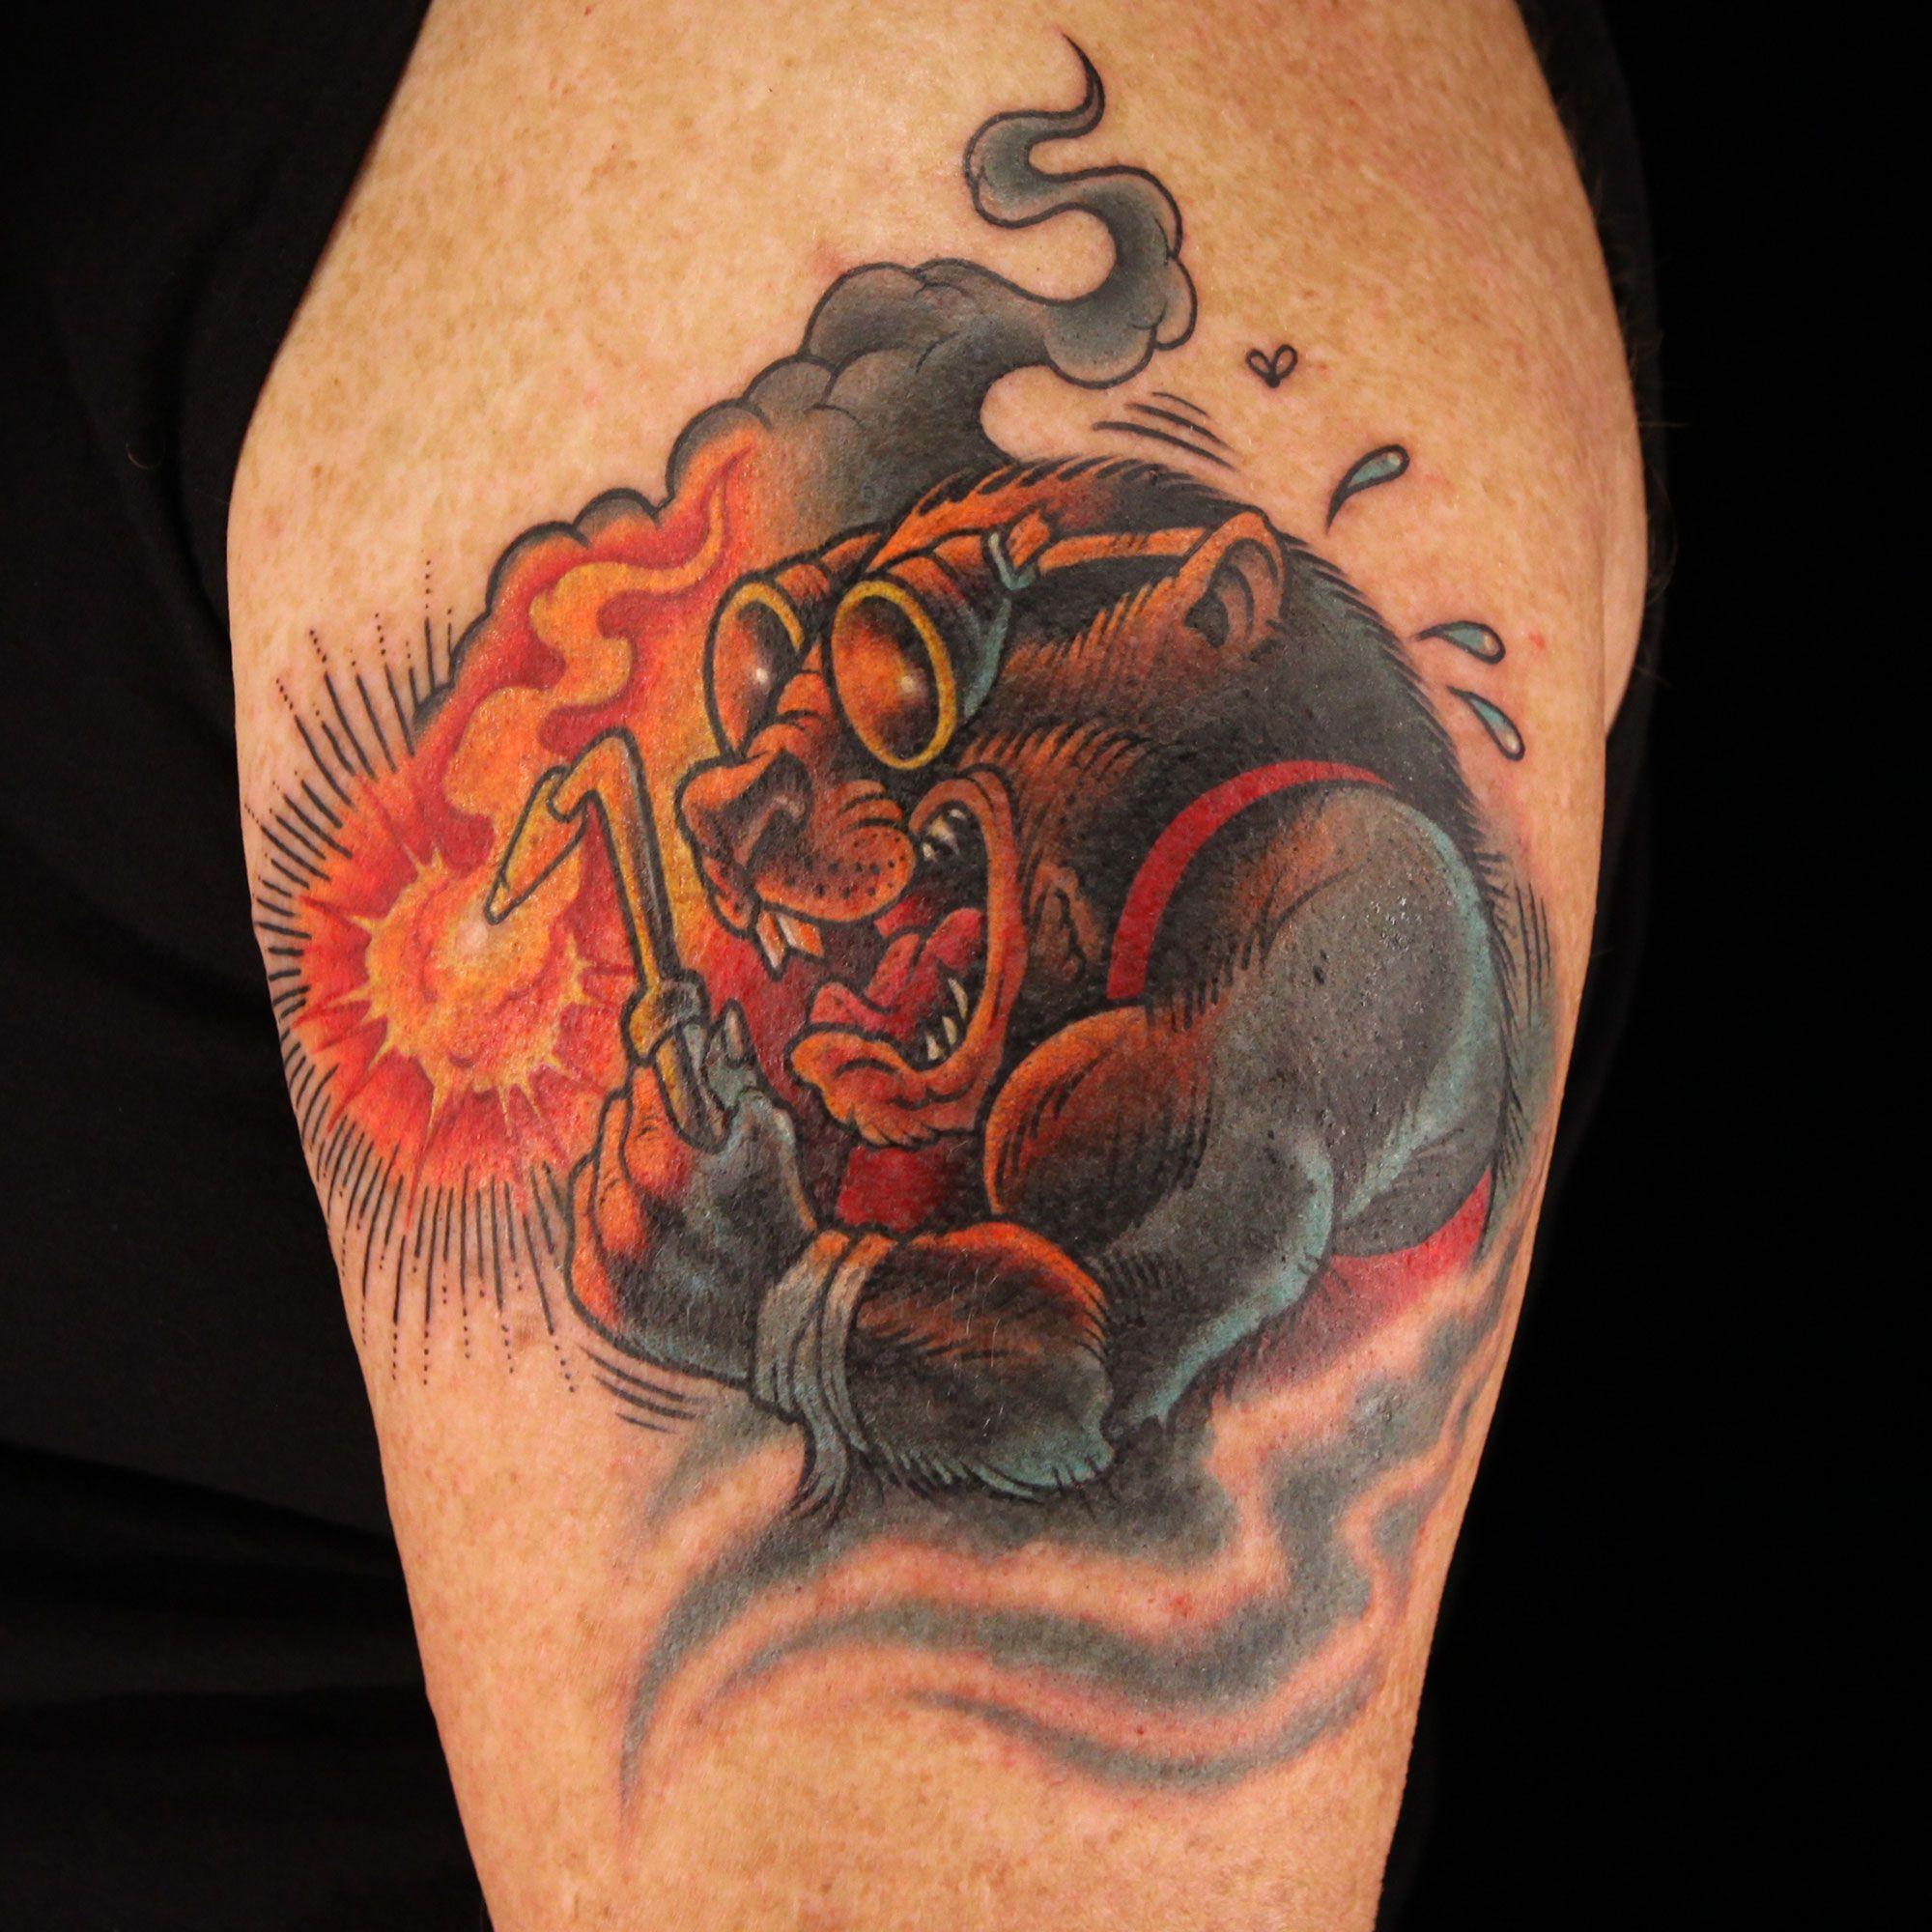 Ink Master S47 / Scott Marshall Tatuaggi